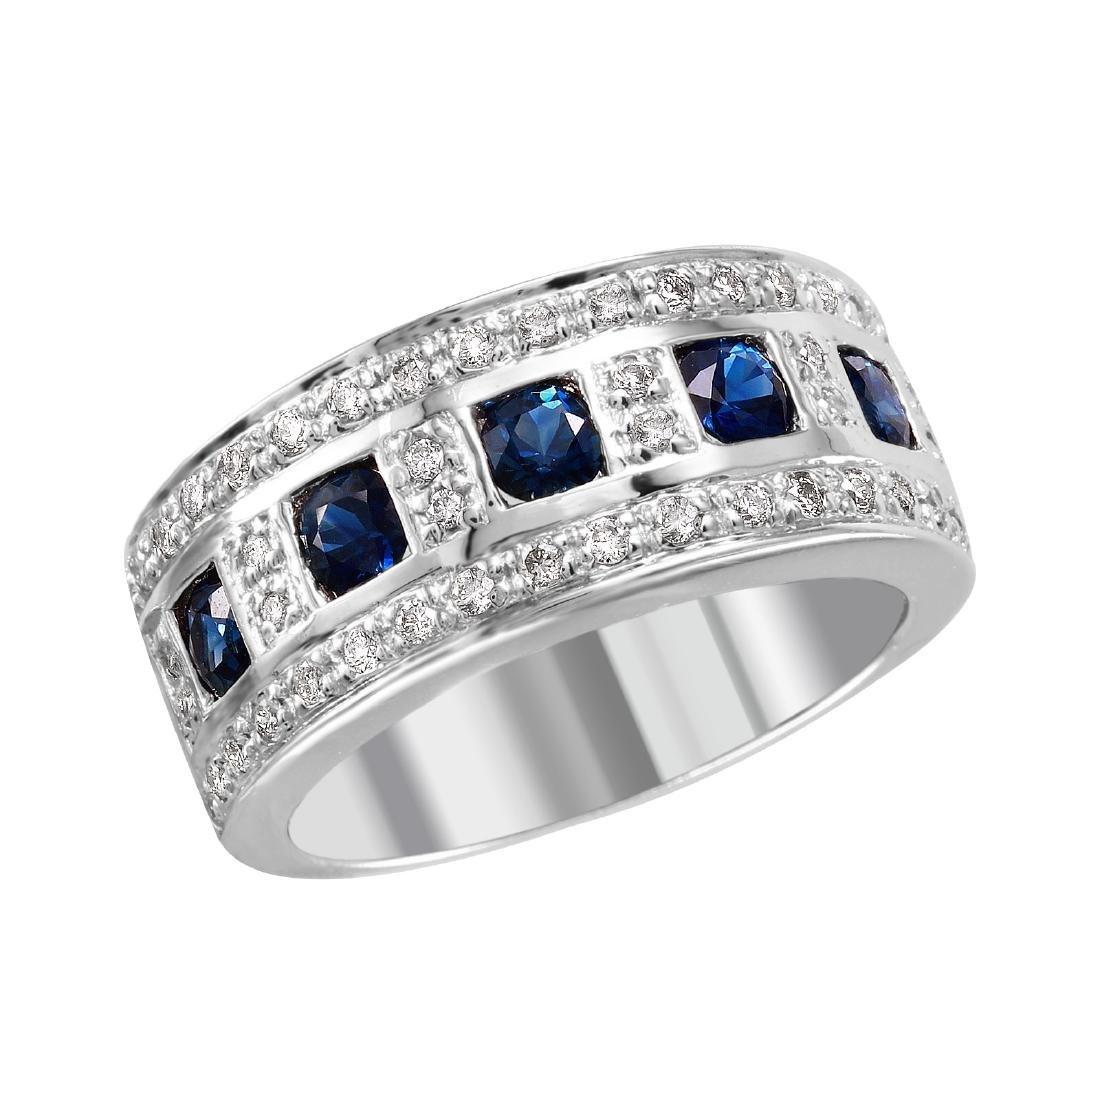 14KT White Gold Sapphire & Diamond Ring